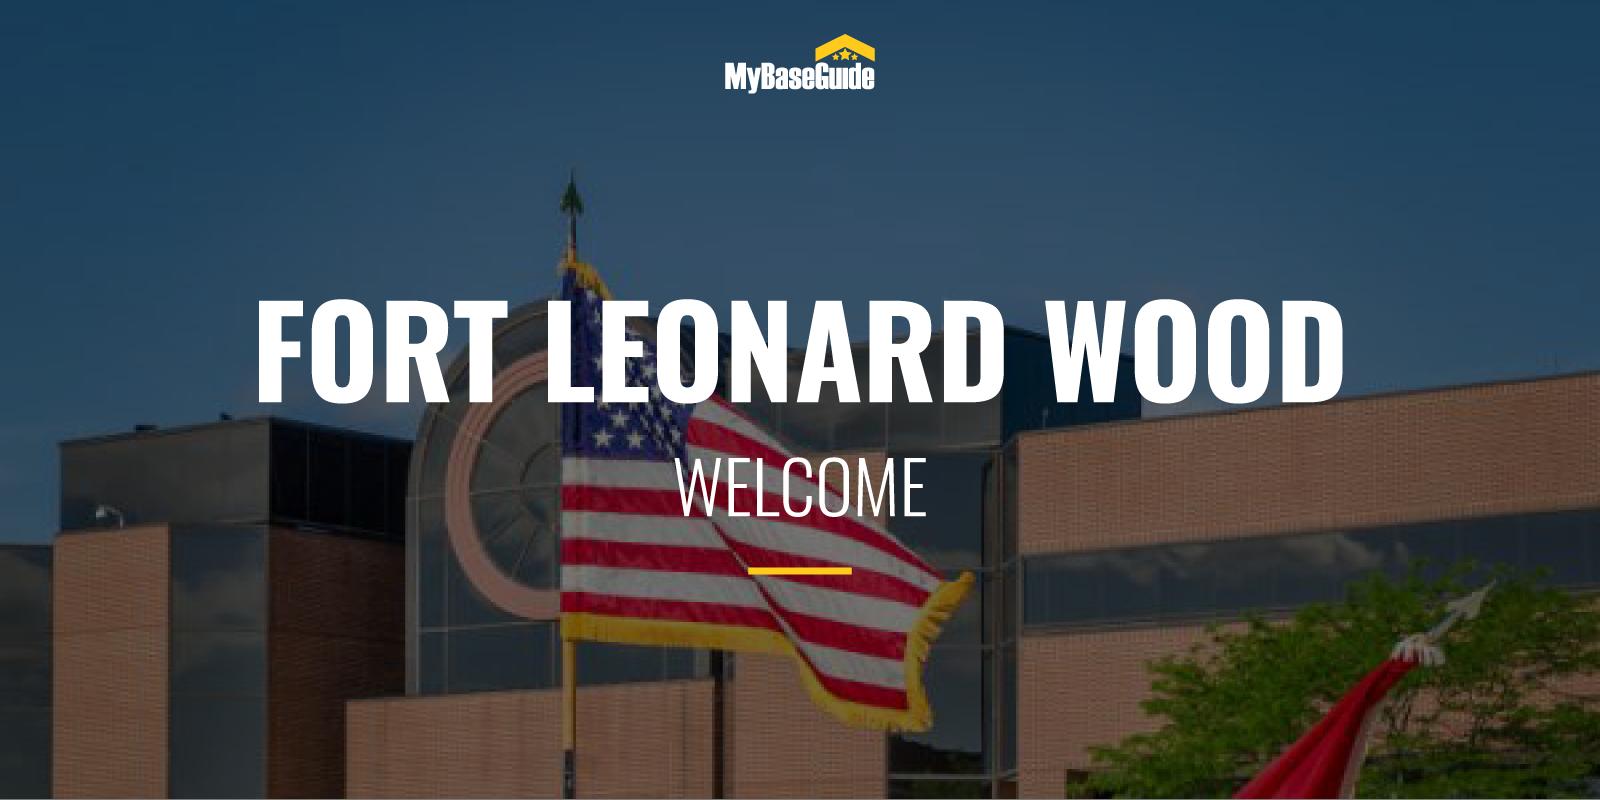 Welcome Fort Leonard Wood